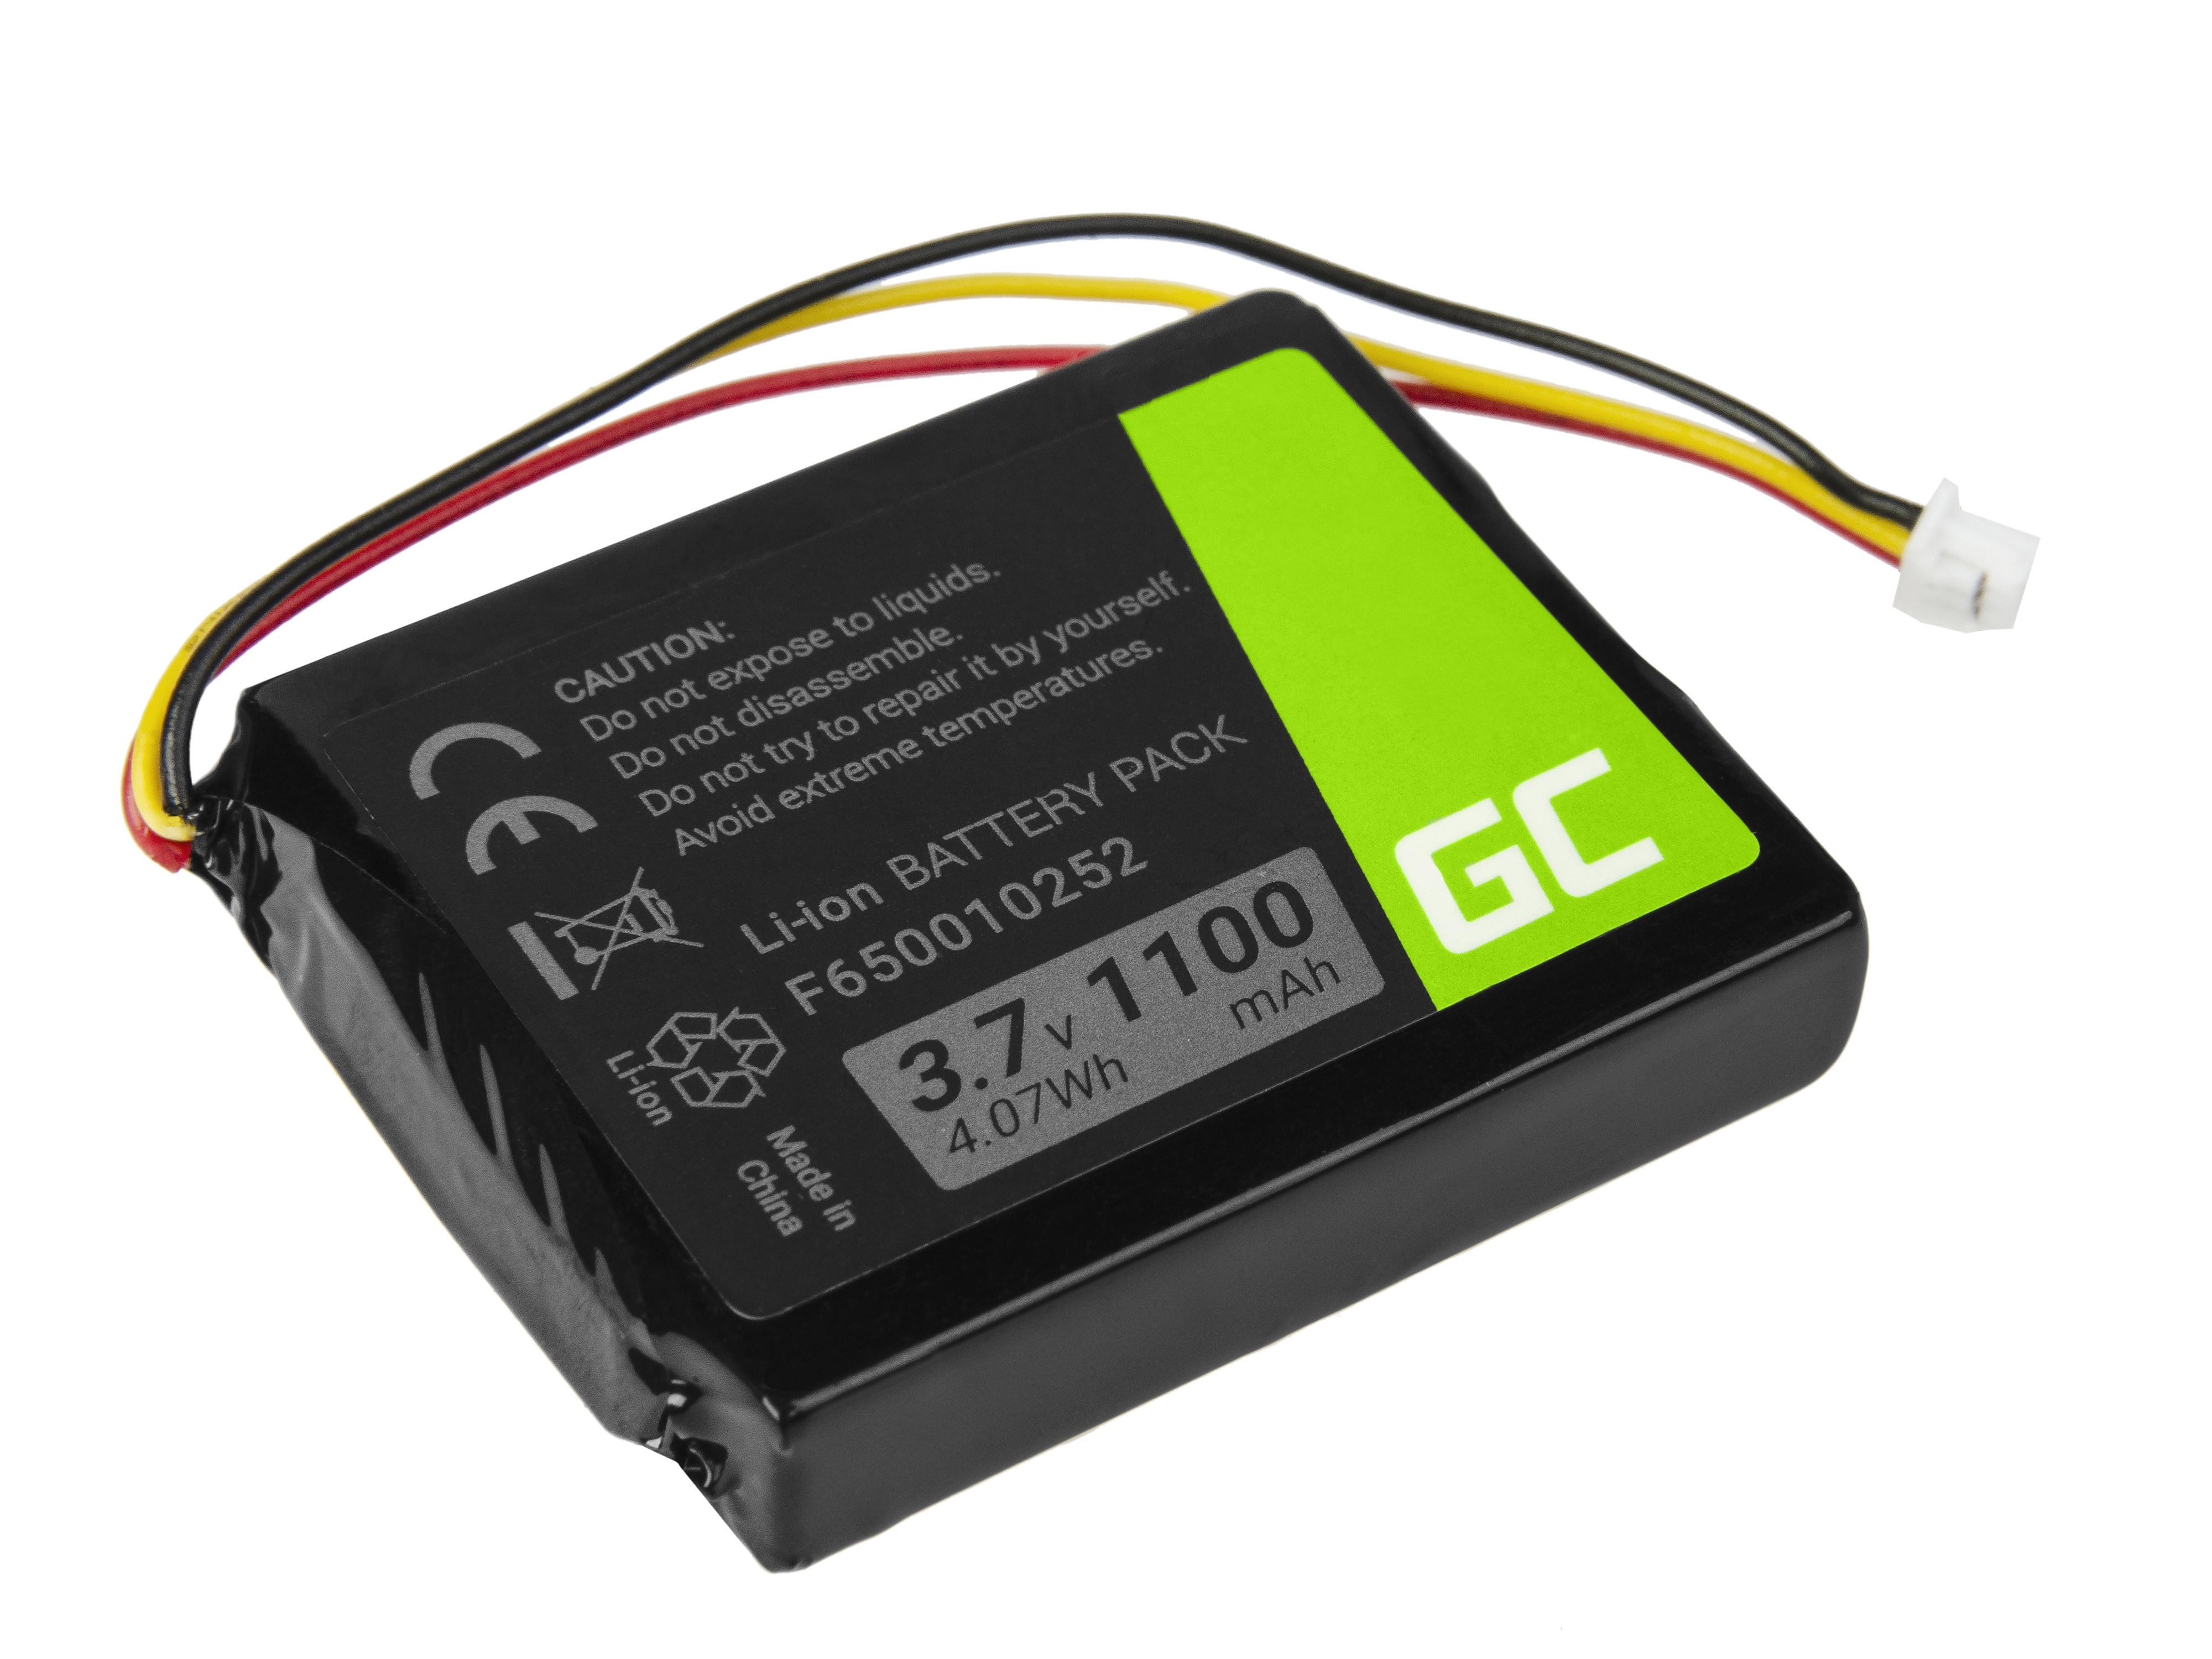 Green Cell Baterie TomTom F650010252 pro GPS TomTom NVT2B225 One Europe V2 V3 V5 One XL IQ Regional S4l Rider 1100mAh Li-ion - neoriginální